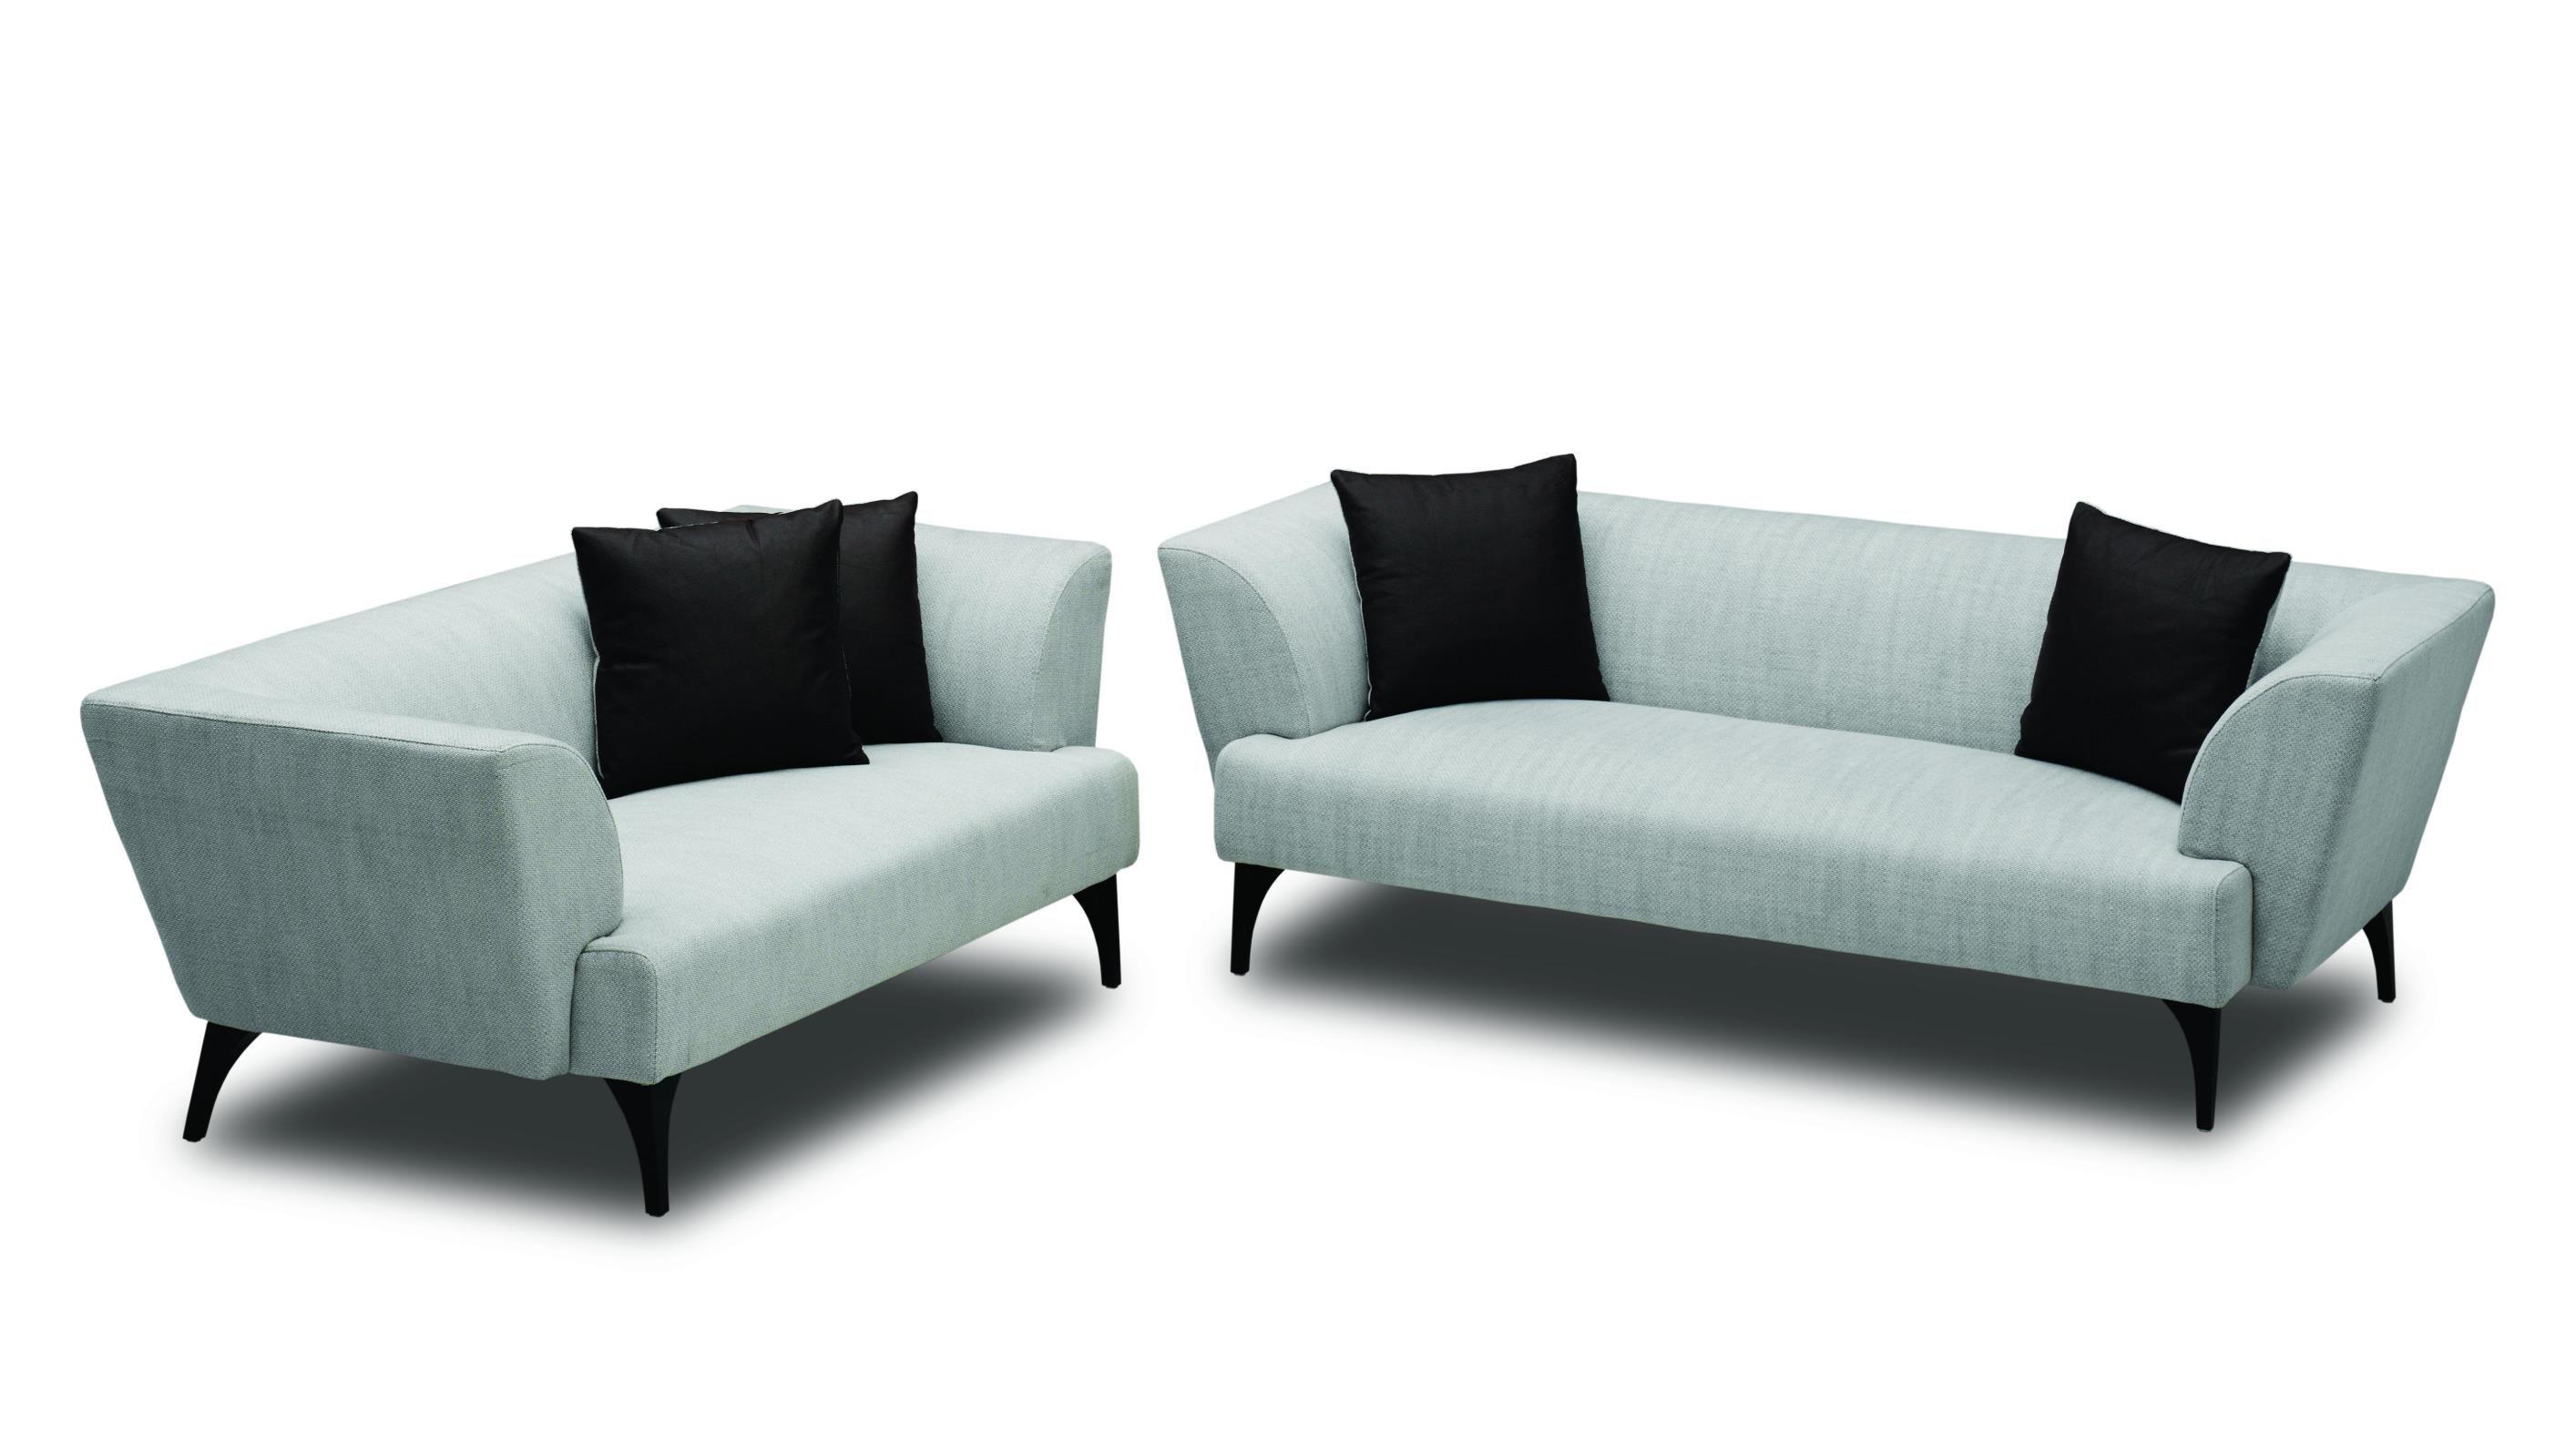 Sofa Manufacturer Modern Simple Wooden Legs Sofa Sofa Manufacturers Simple Sofa Sofa Set